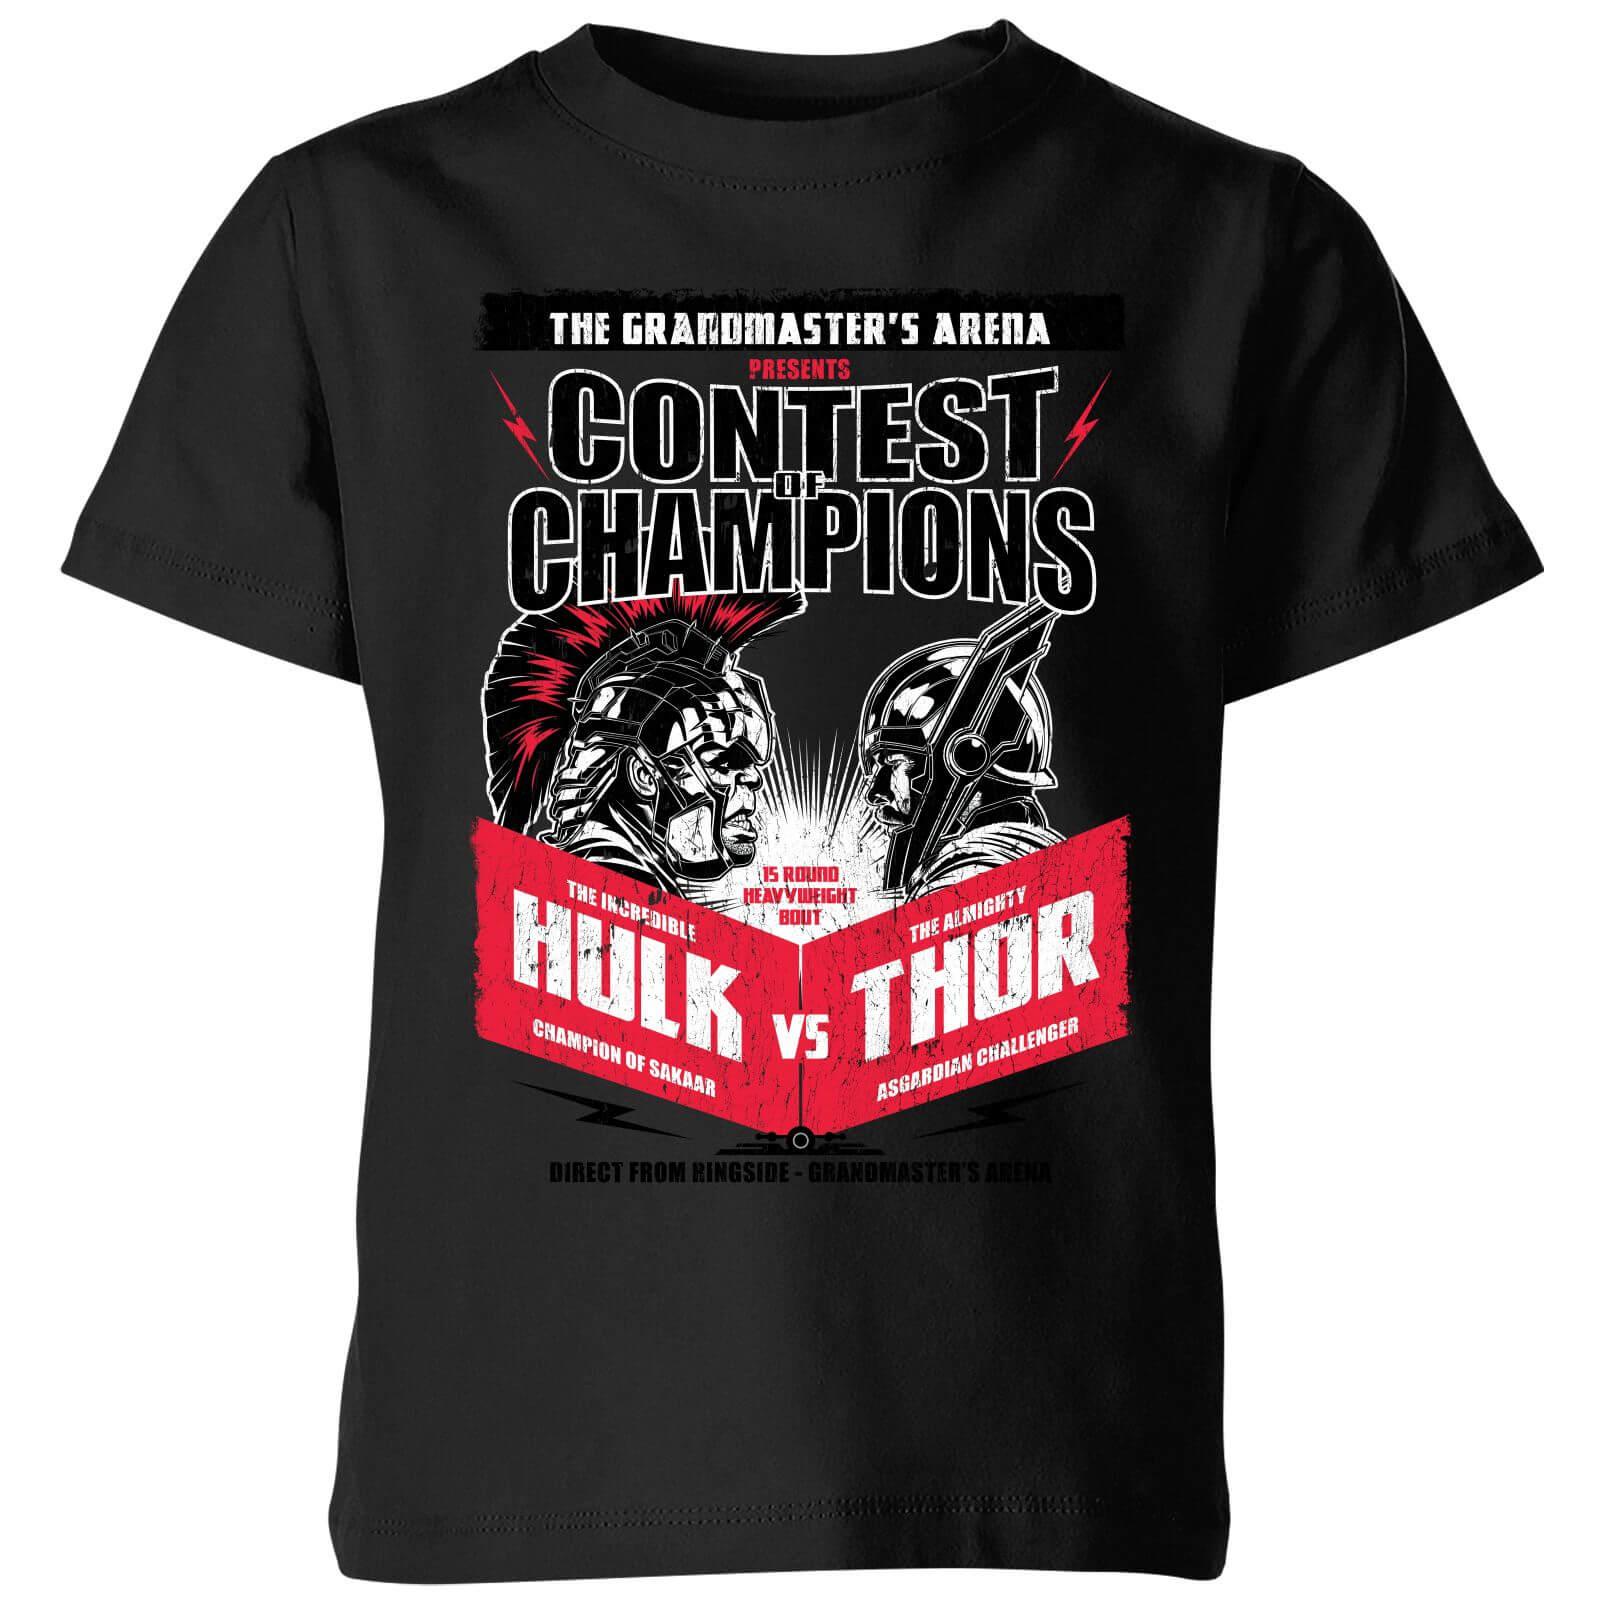 OfferteWeb.click 66-t-shirt-marvel-thor-ragnarok-champions-poster-nero